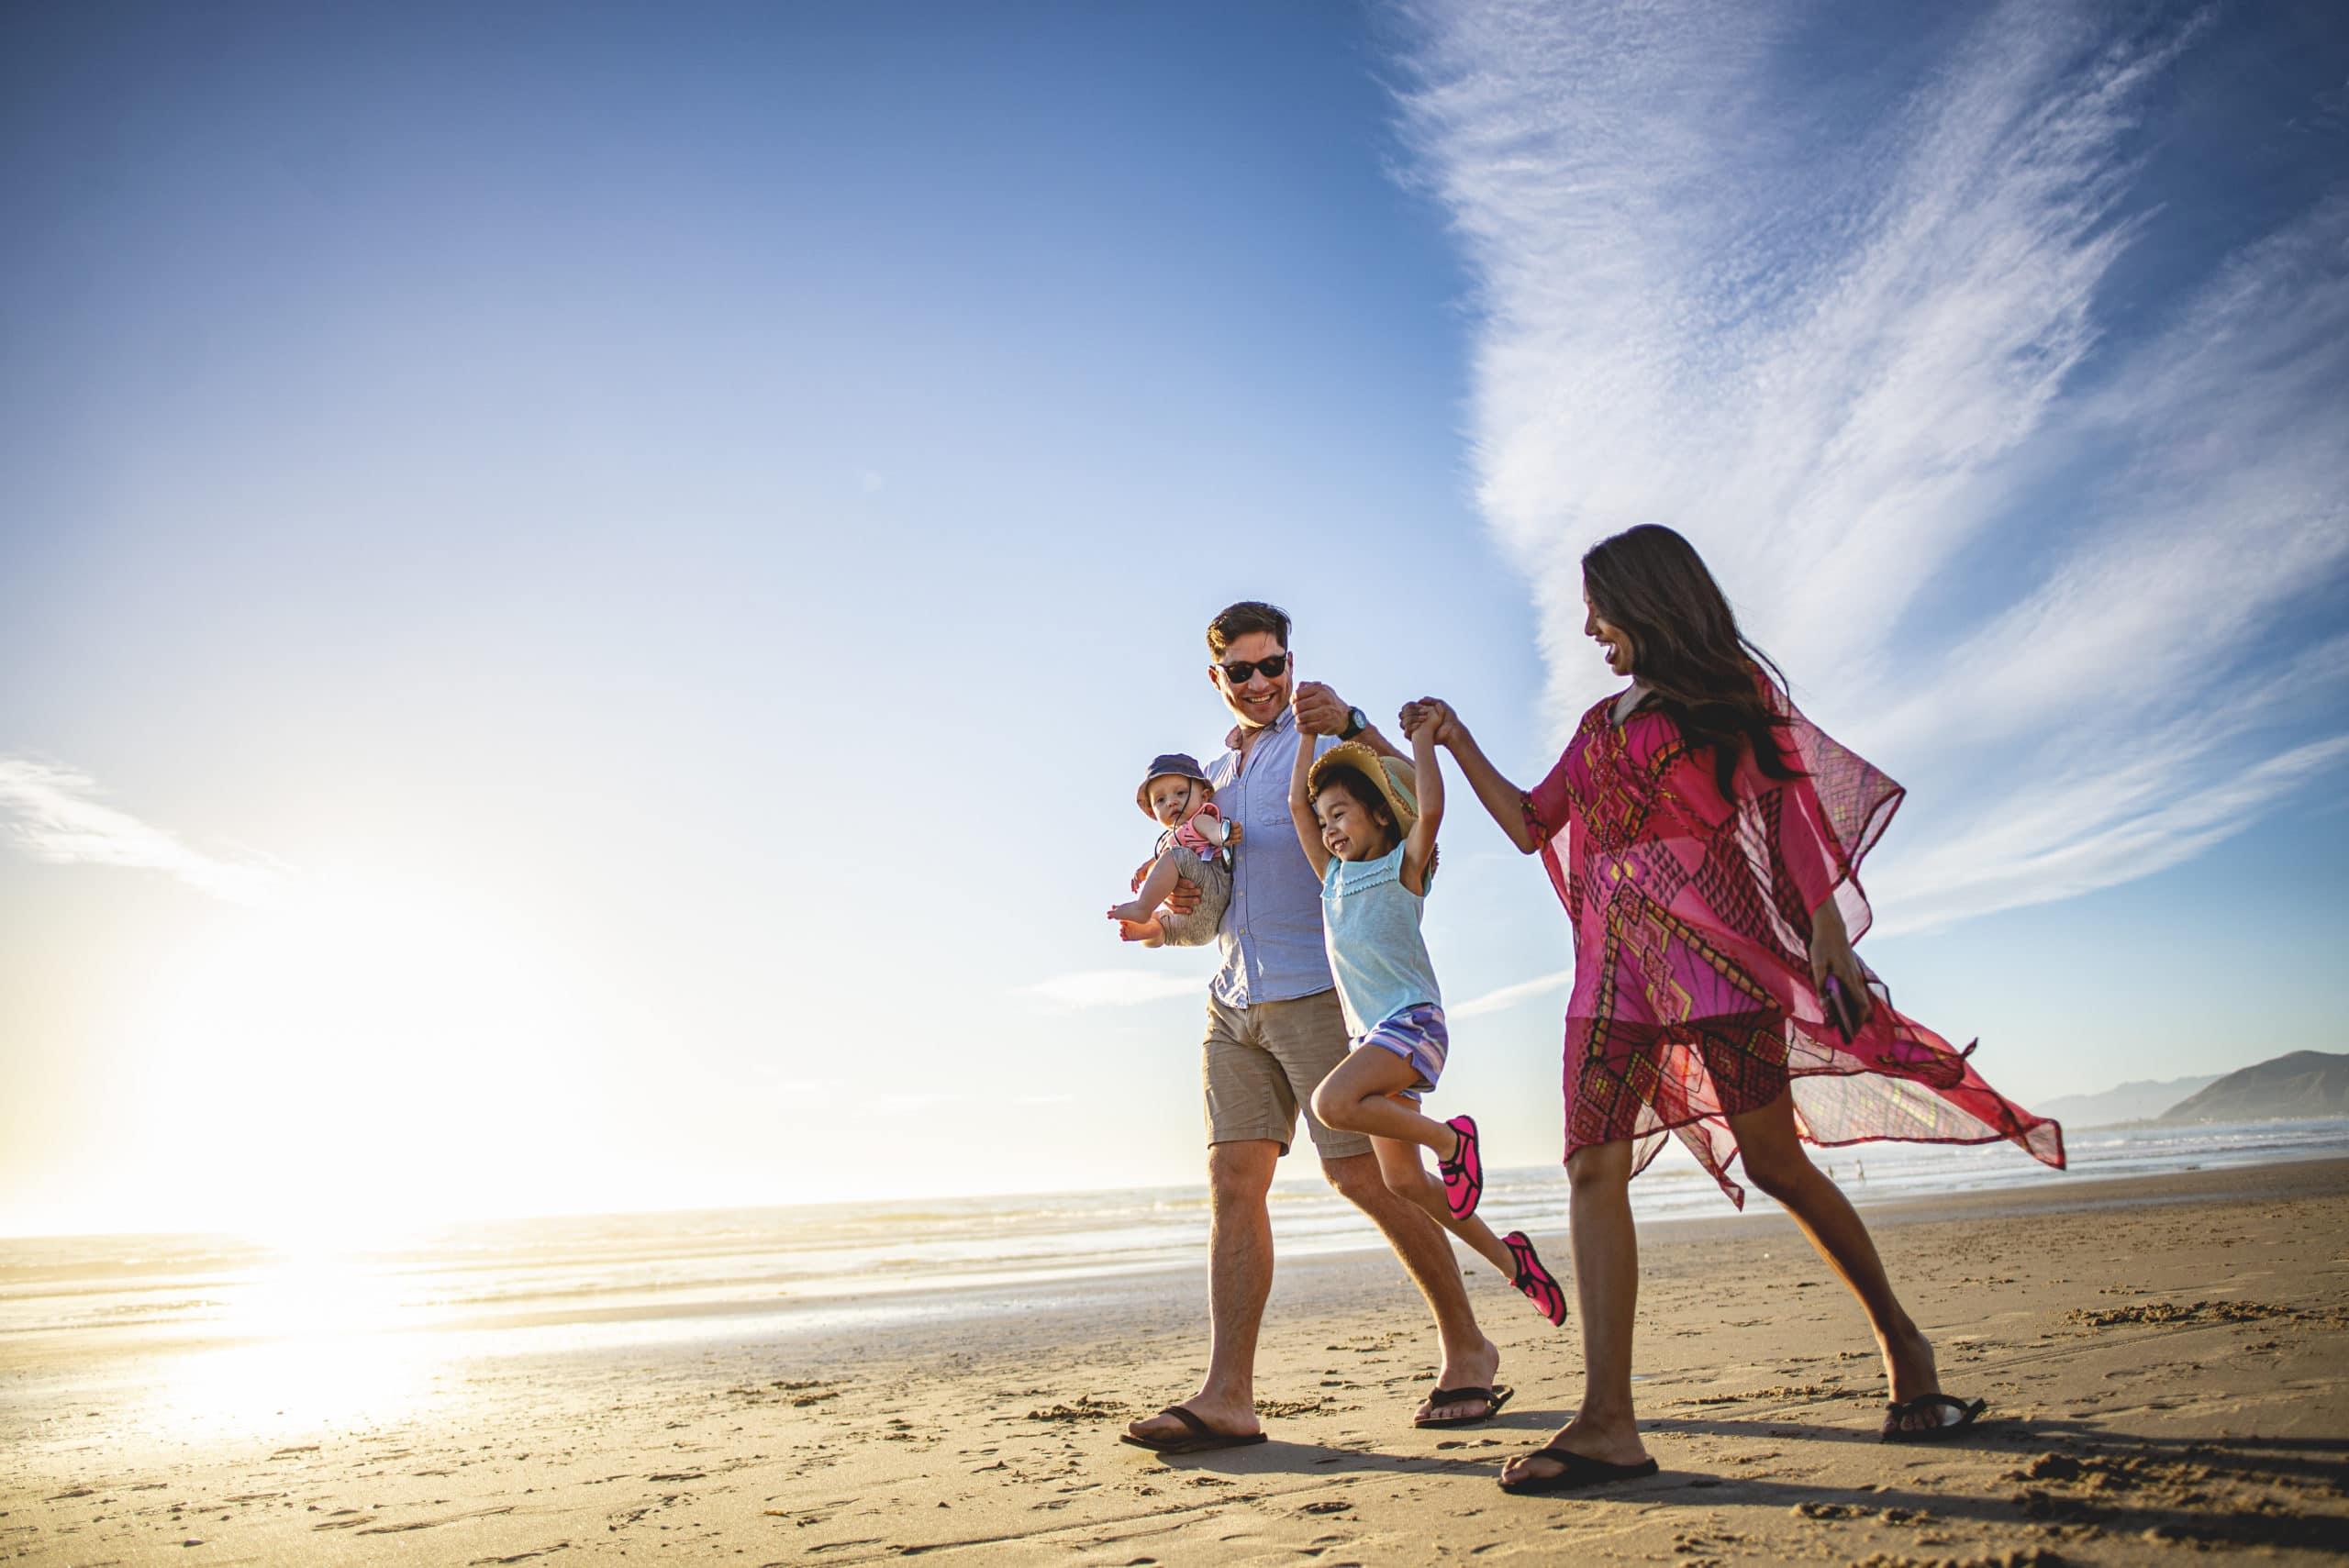 Oxnard_Port Hueneme_Ventura_Beach_Family Time_Landscape (10)